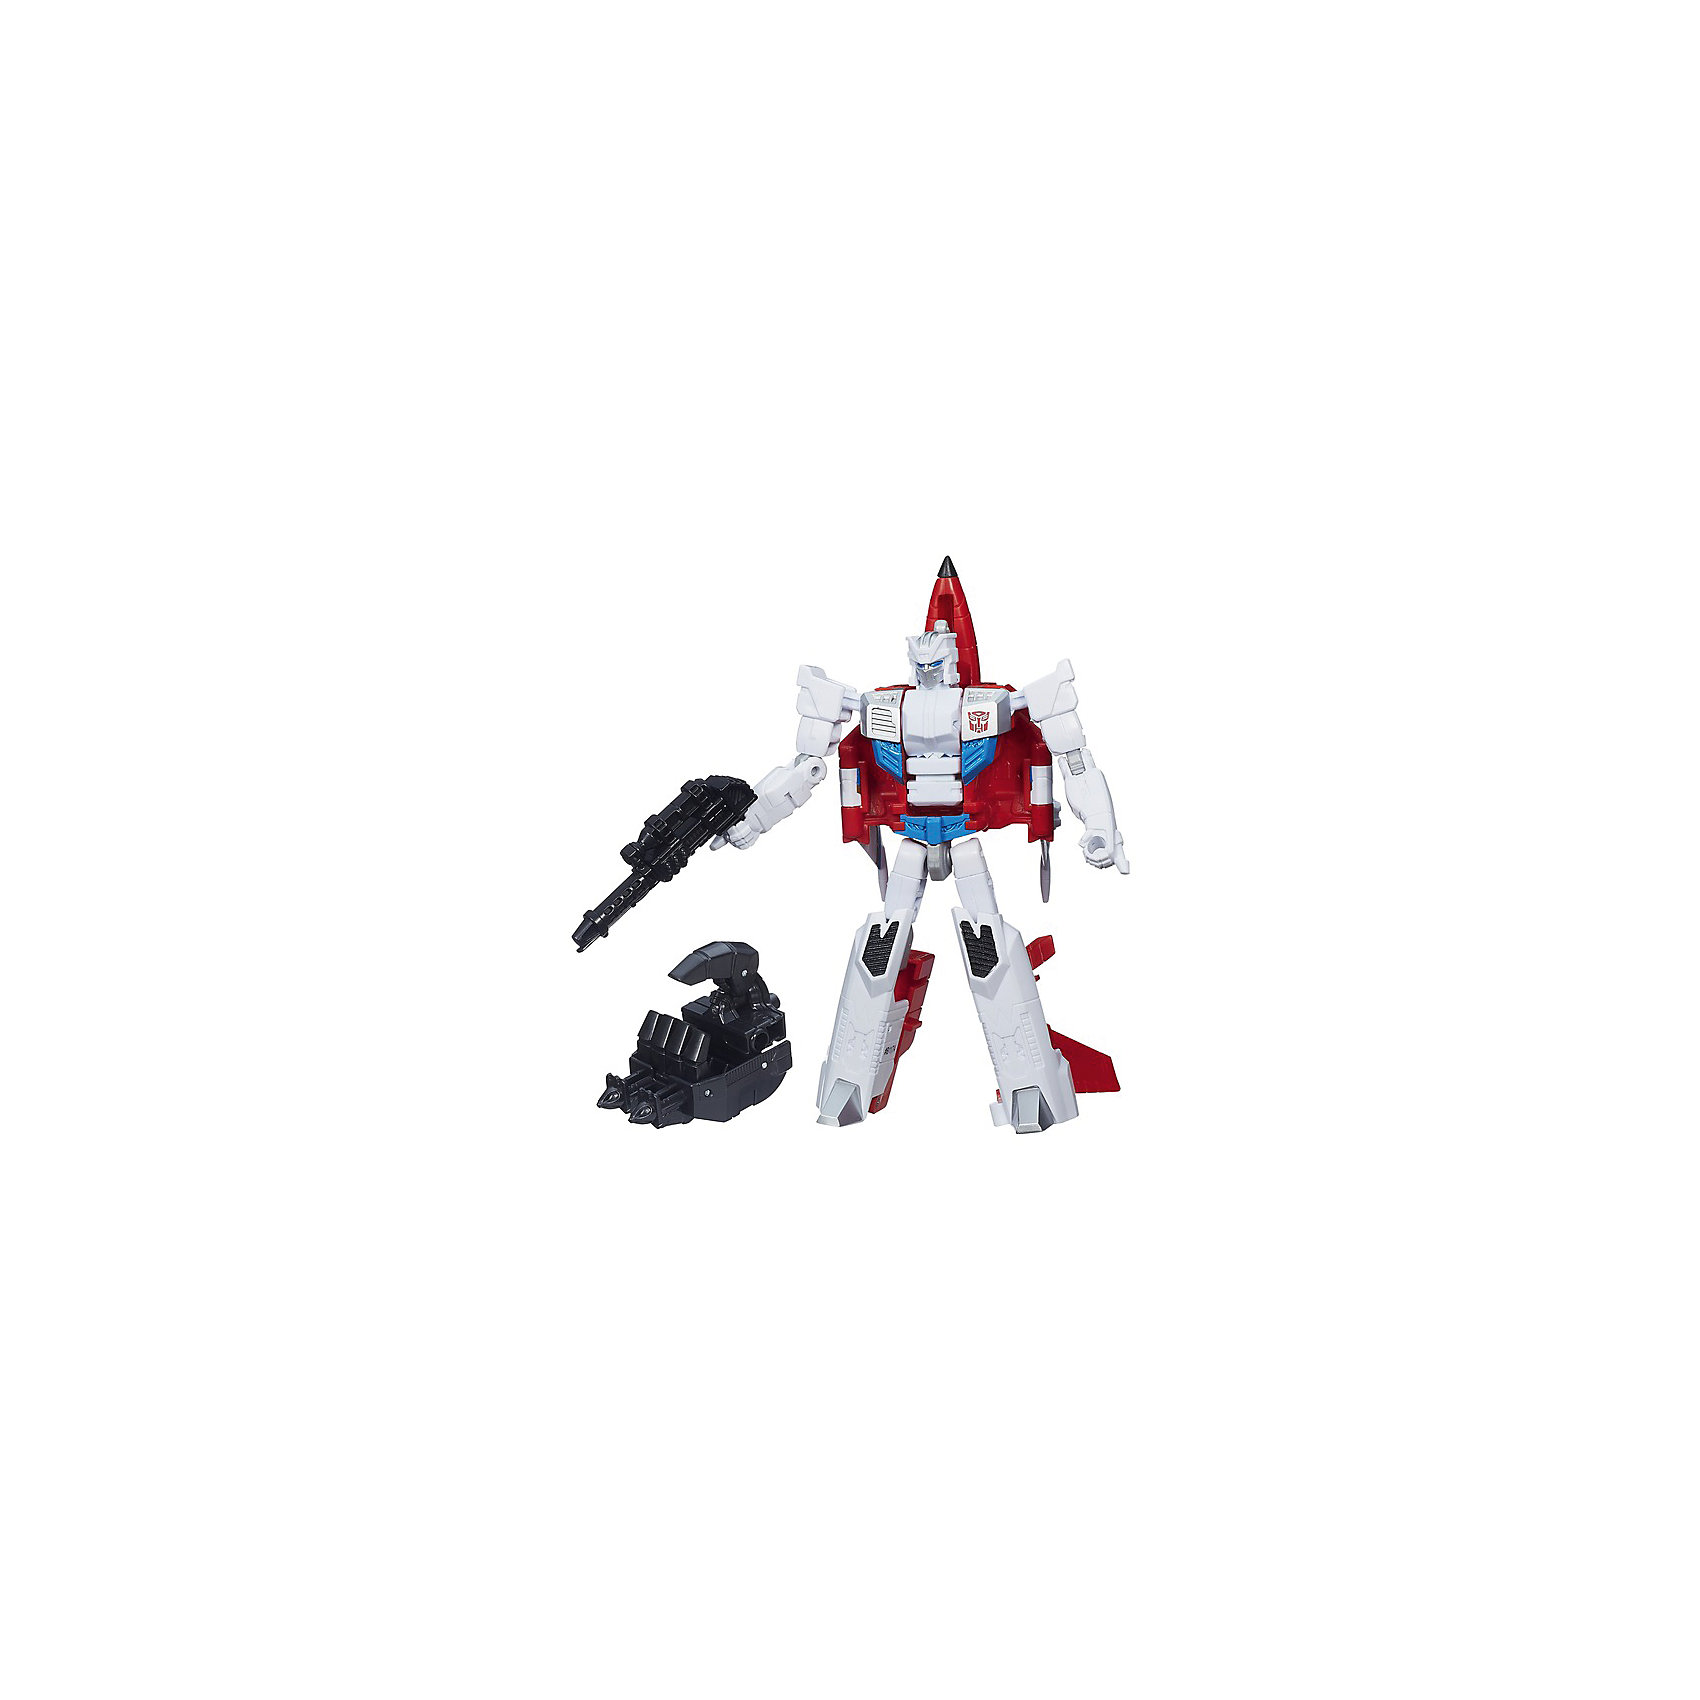 Hasbro Дженерэйшнс Делюкс, Трансформеры, B0974/B5606 transformers b0974 делюкс бласт офф